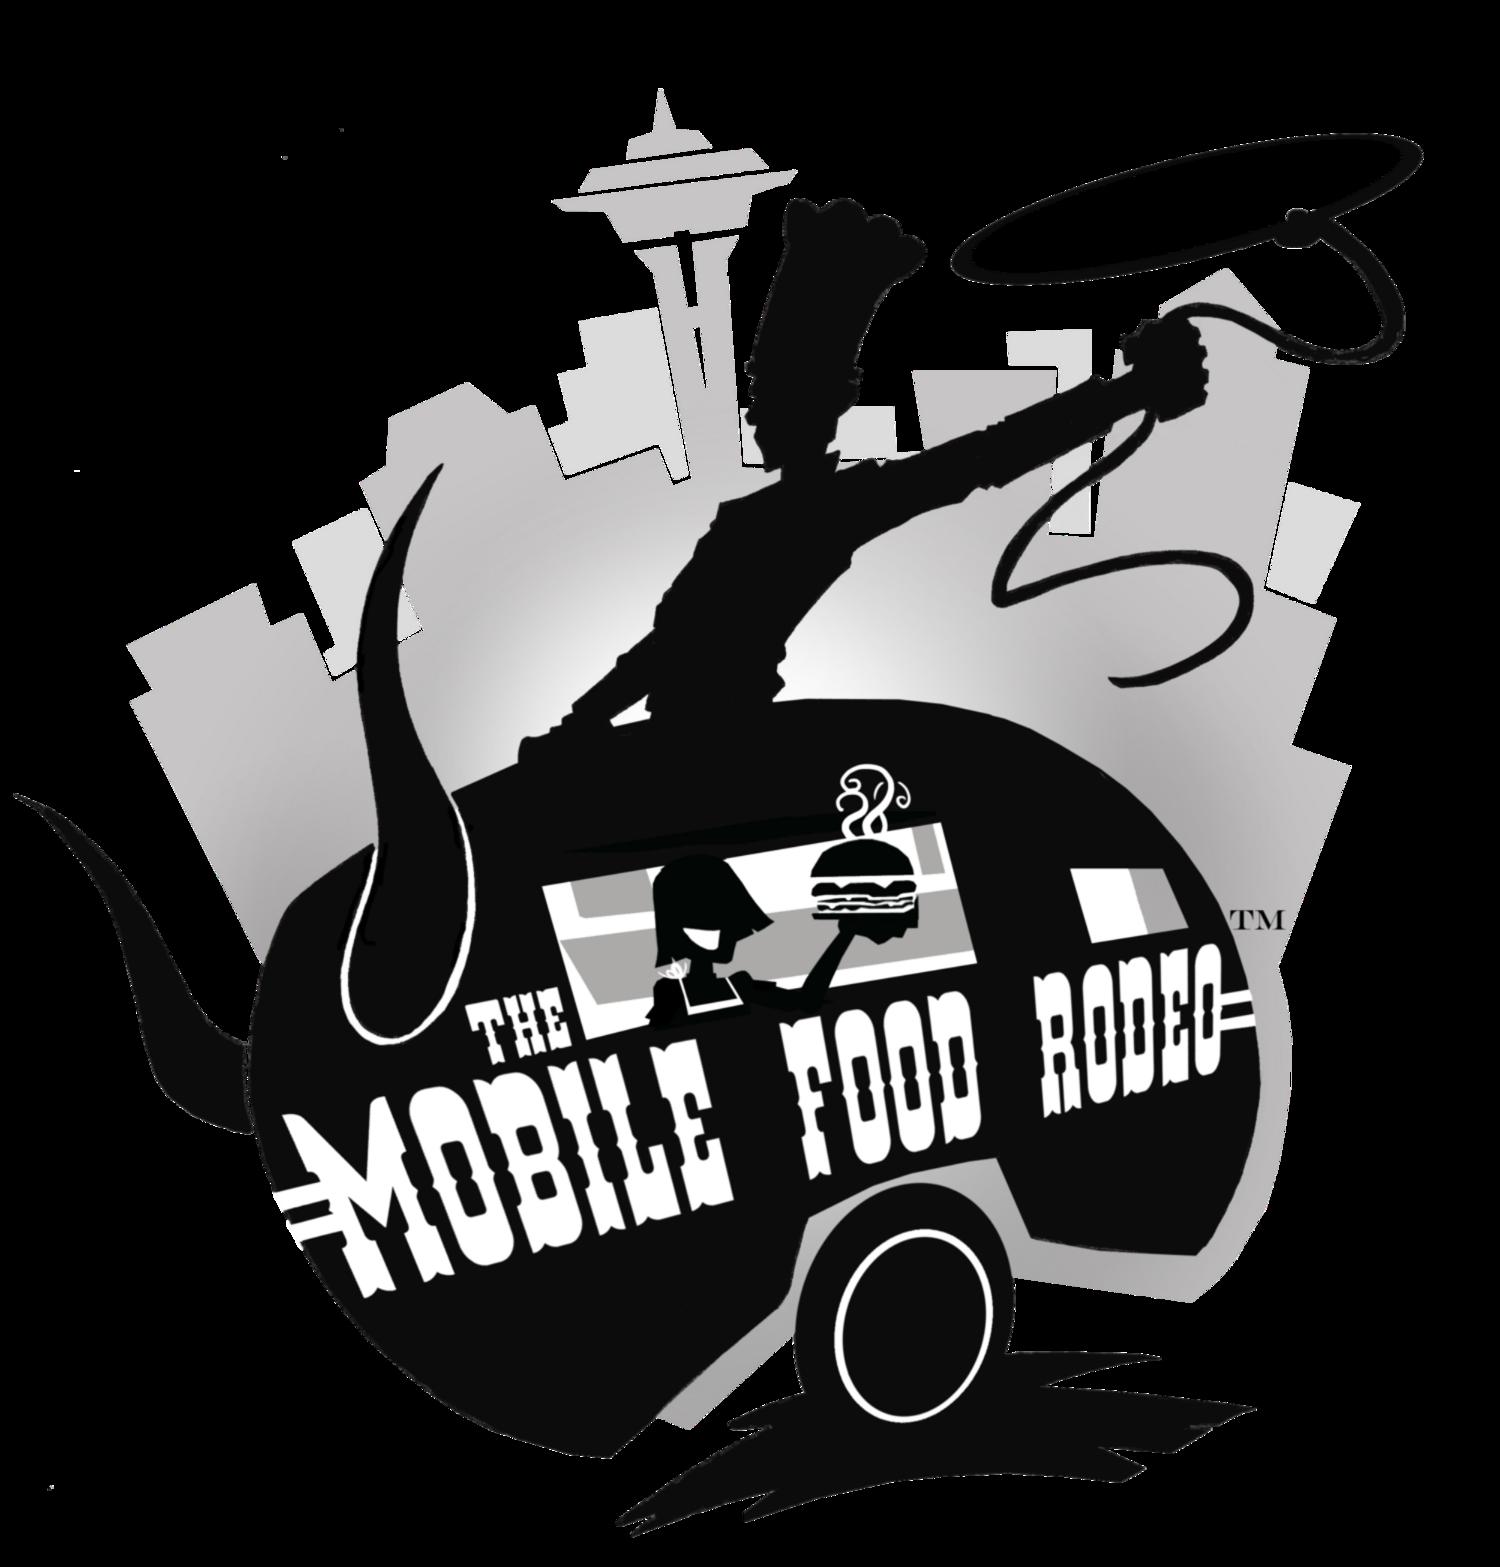 Food prototip studio logo. Festival clipart street festival